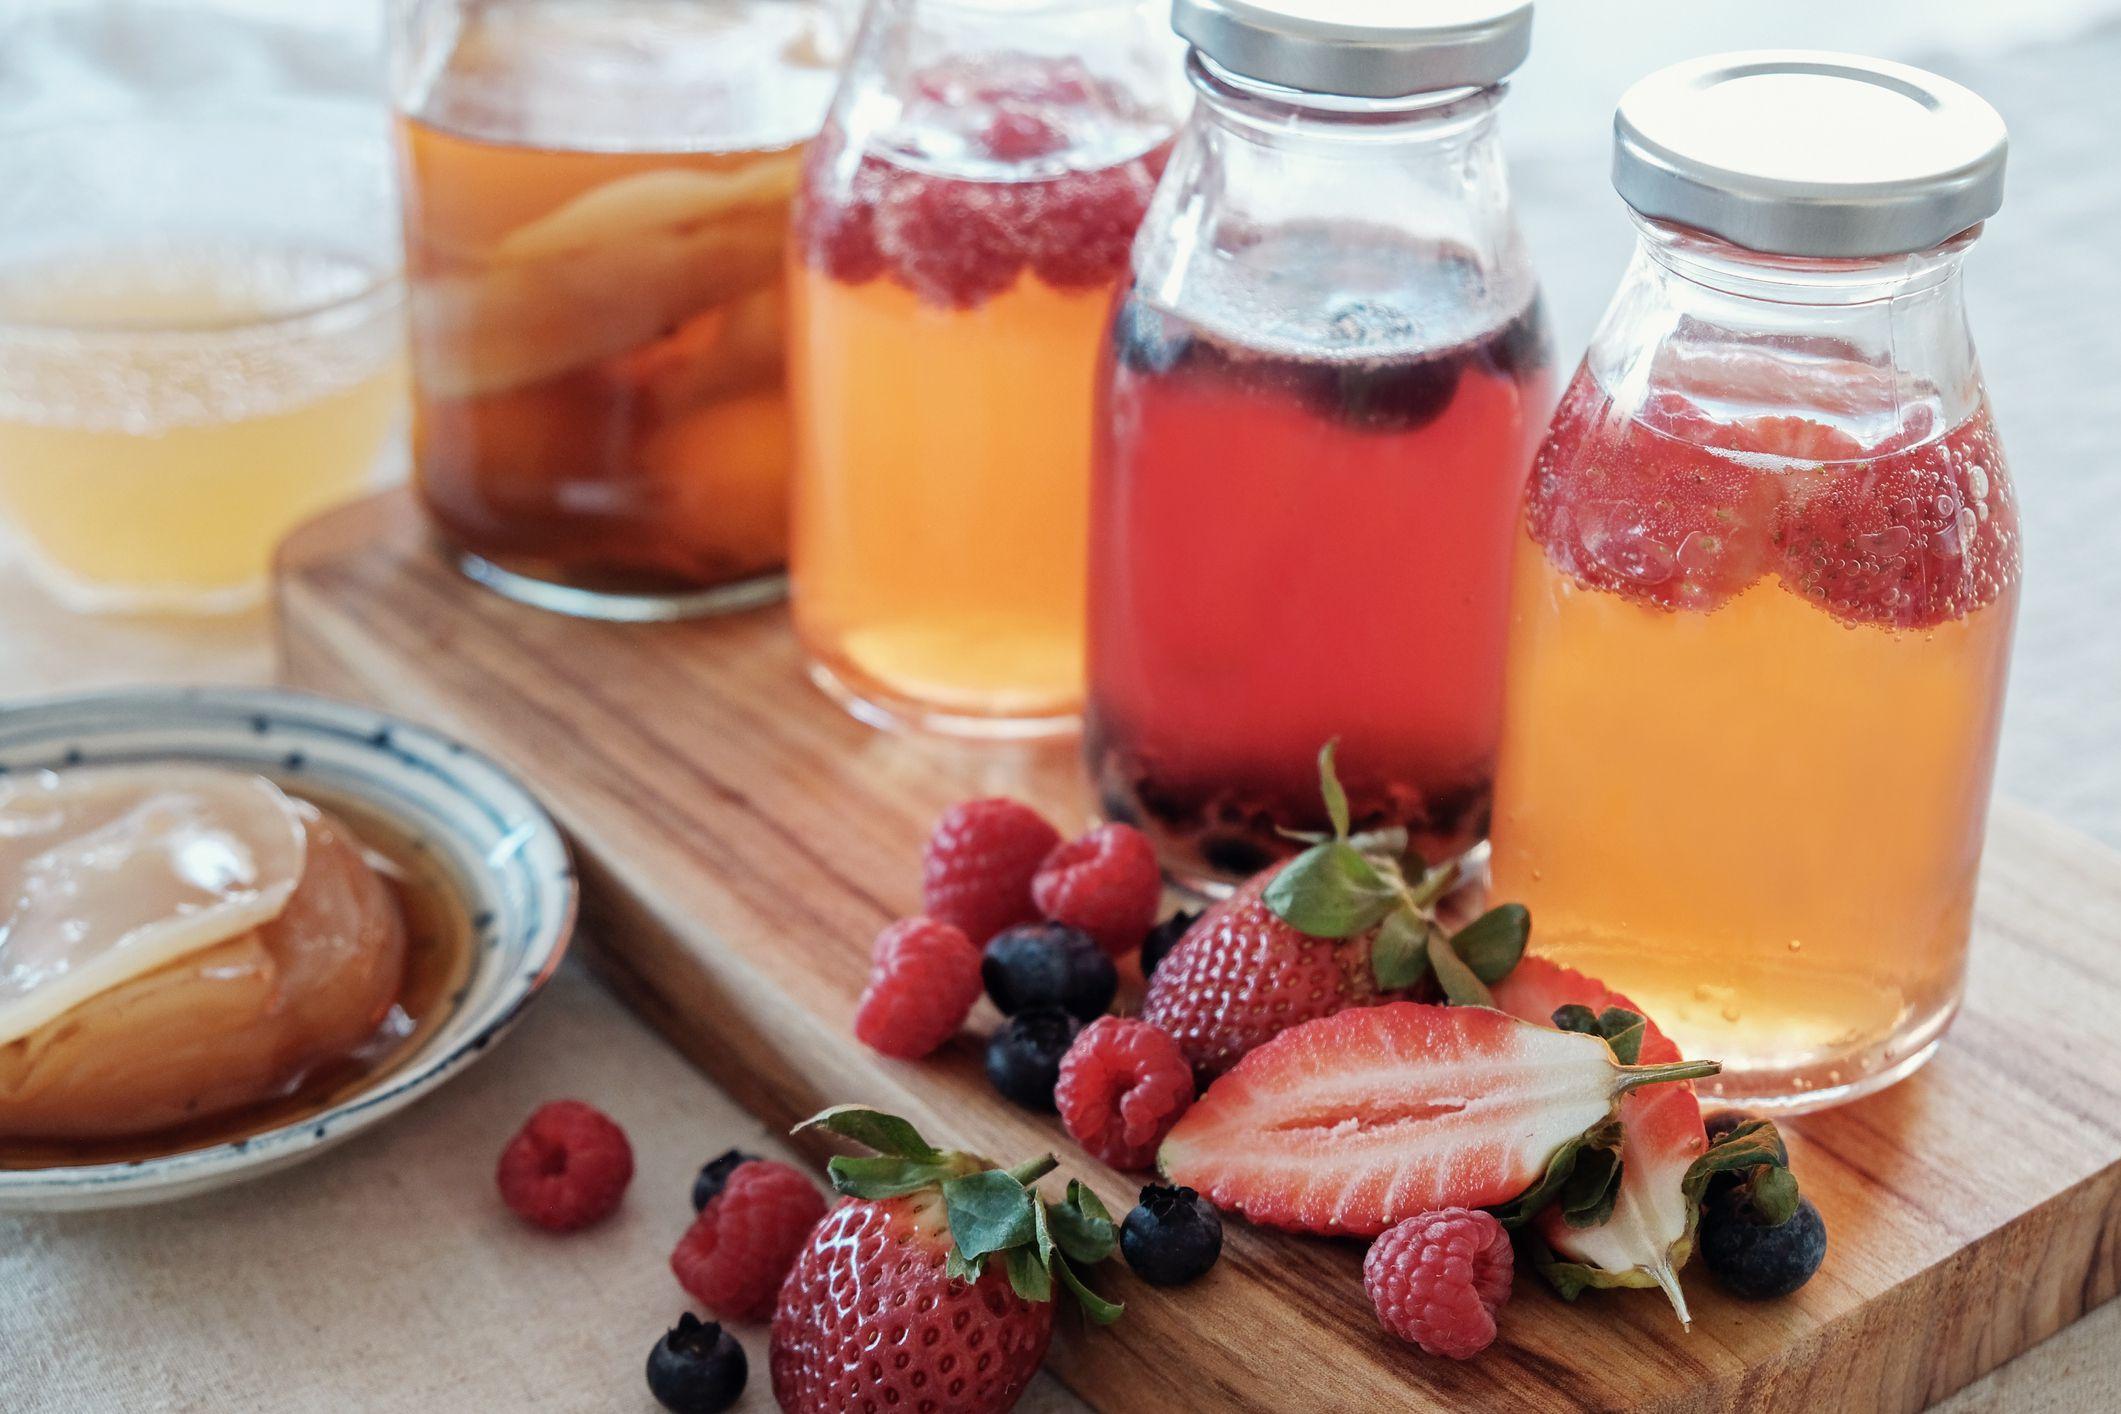 The 8 Best Probiotic Drinks of 2020